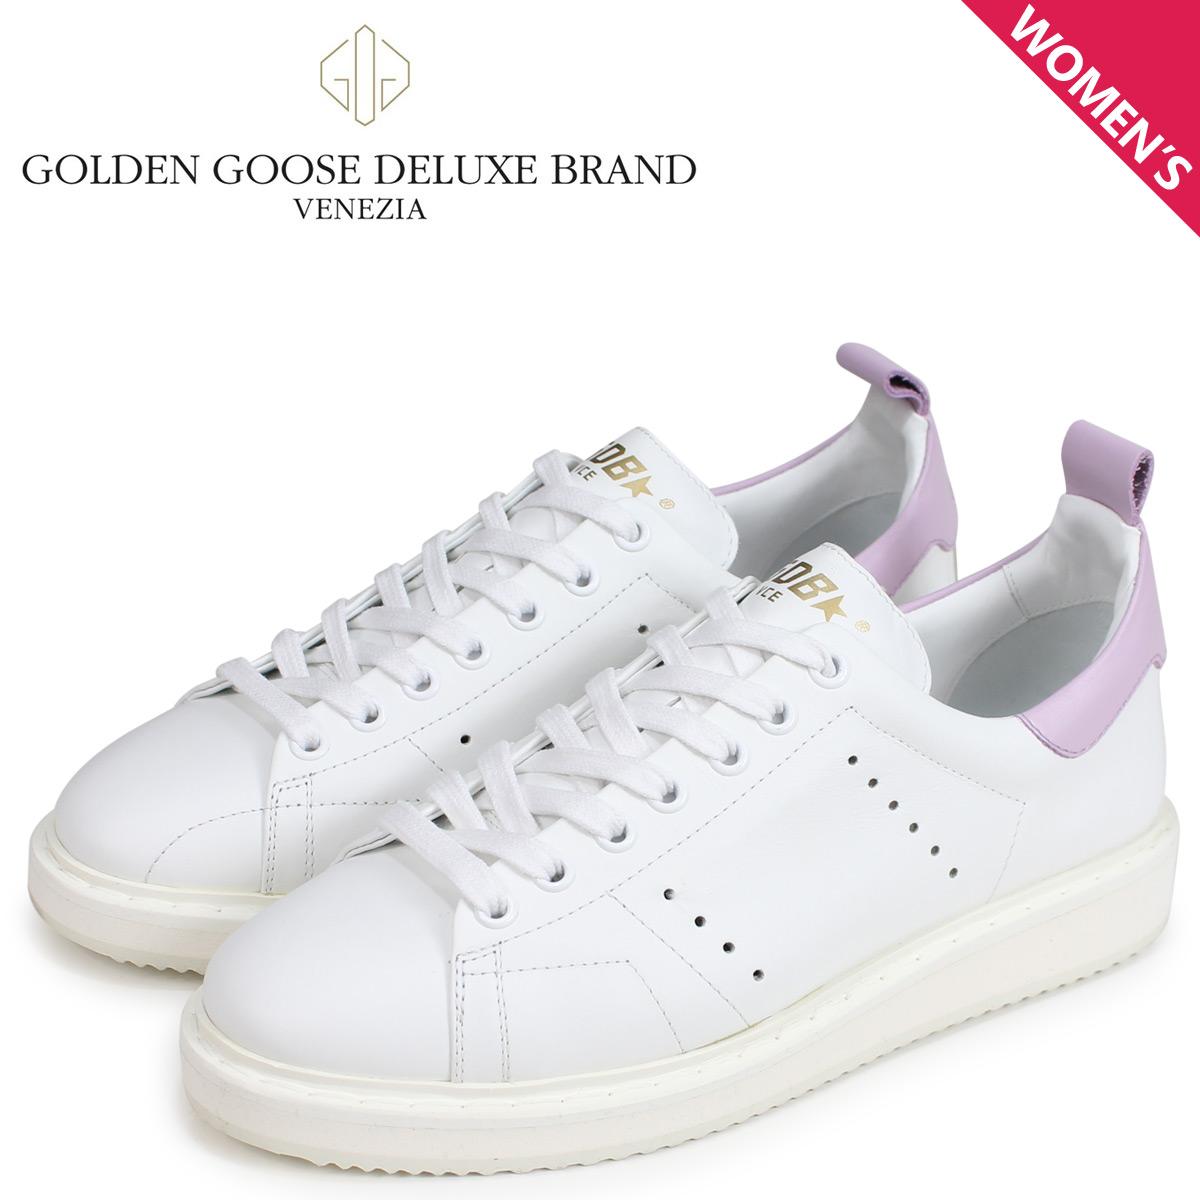 Golden Goose ゴールデングース スニーカー レディース スターター SNEAKERS STARTER ホワイト 白 G33WS631 M3